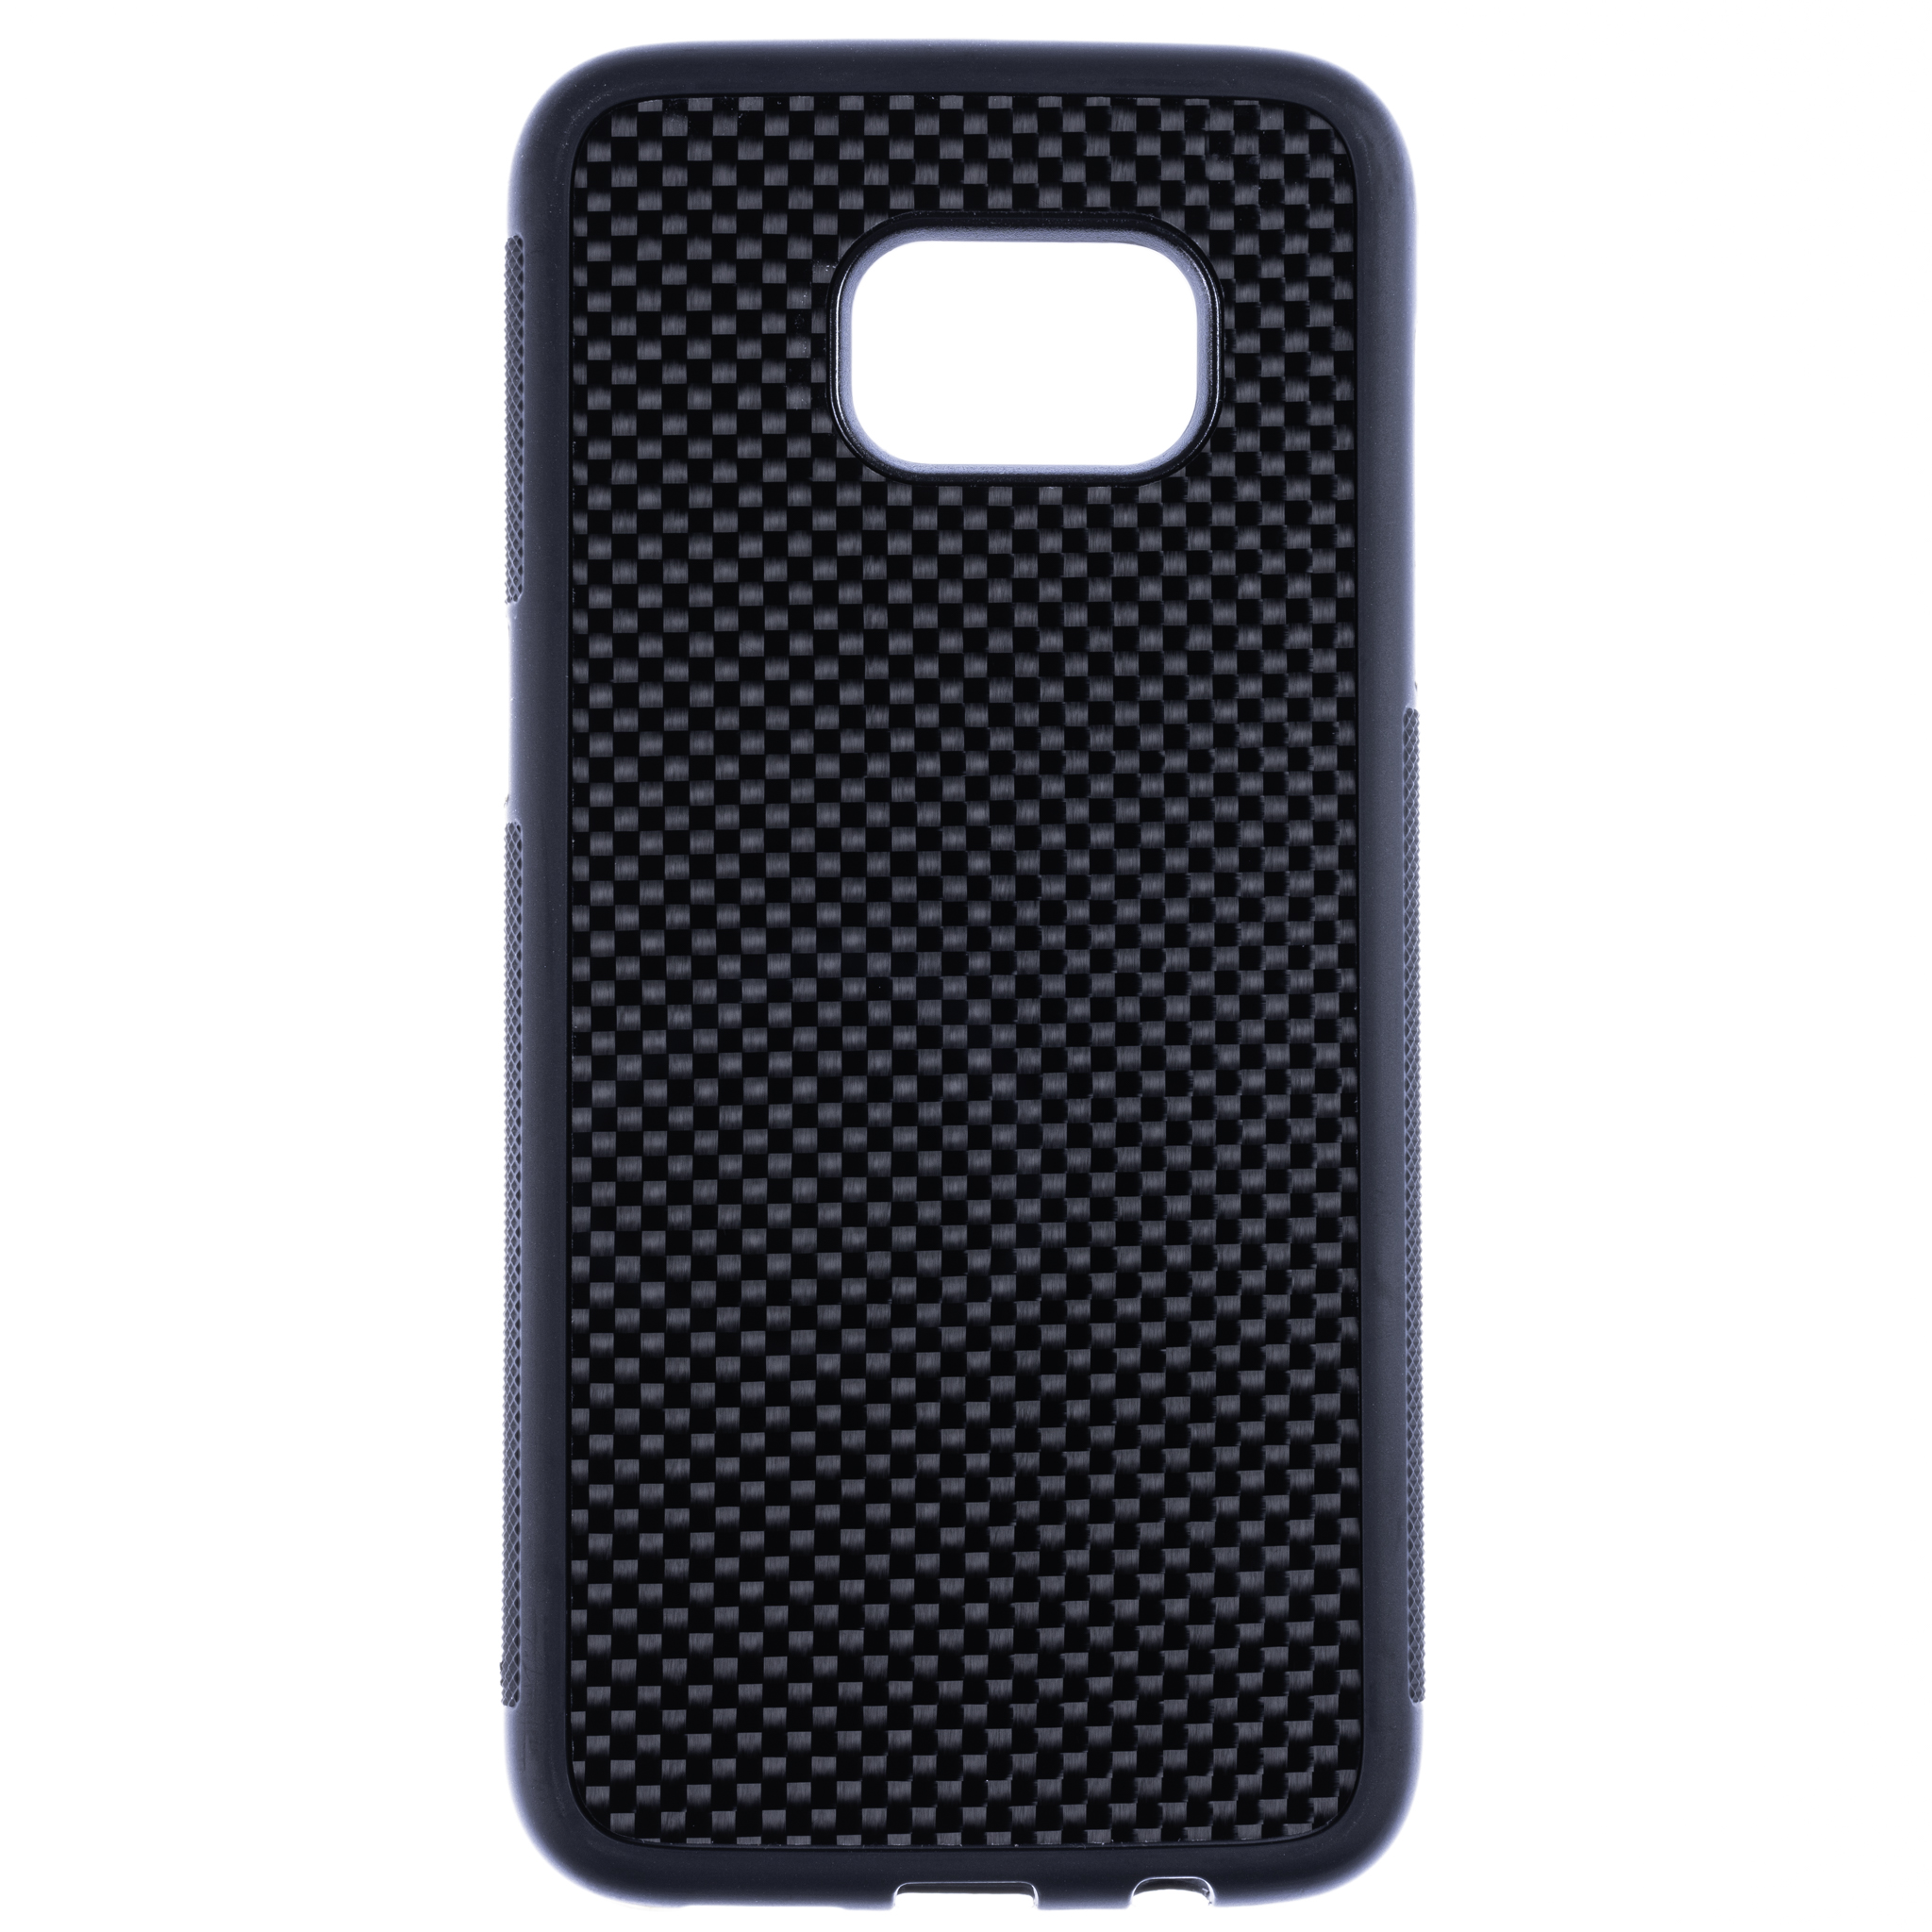 Samsung S7 Edge Carbon Fibre Case